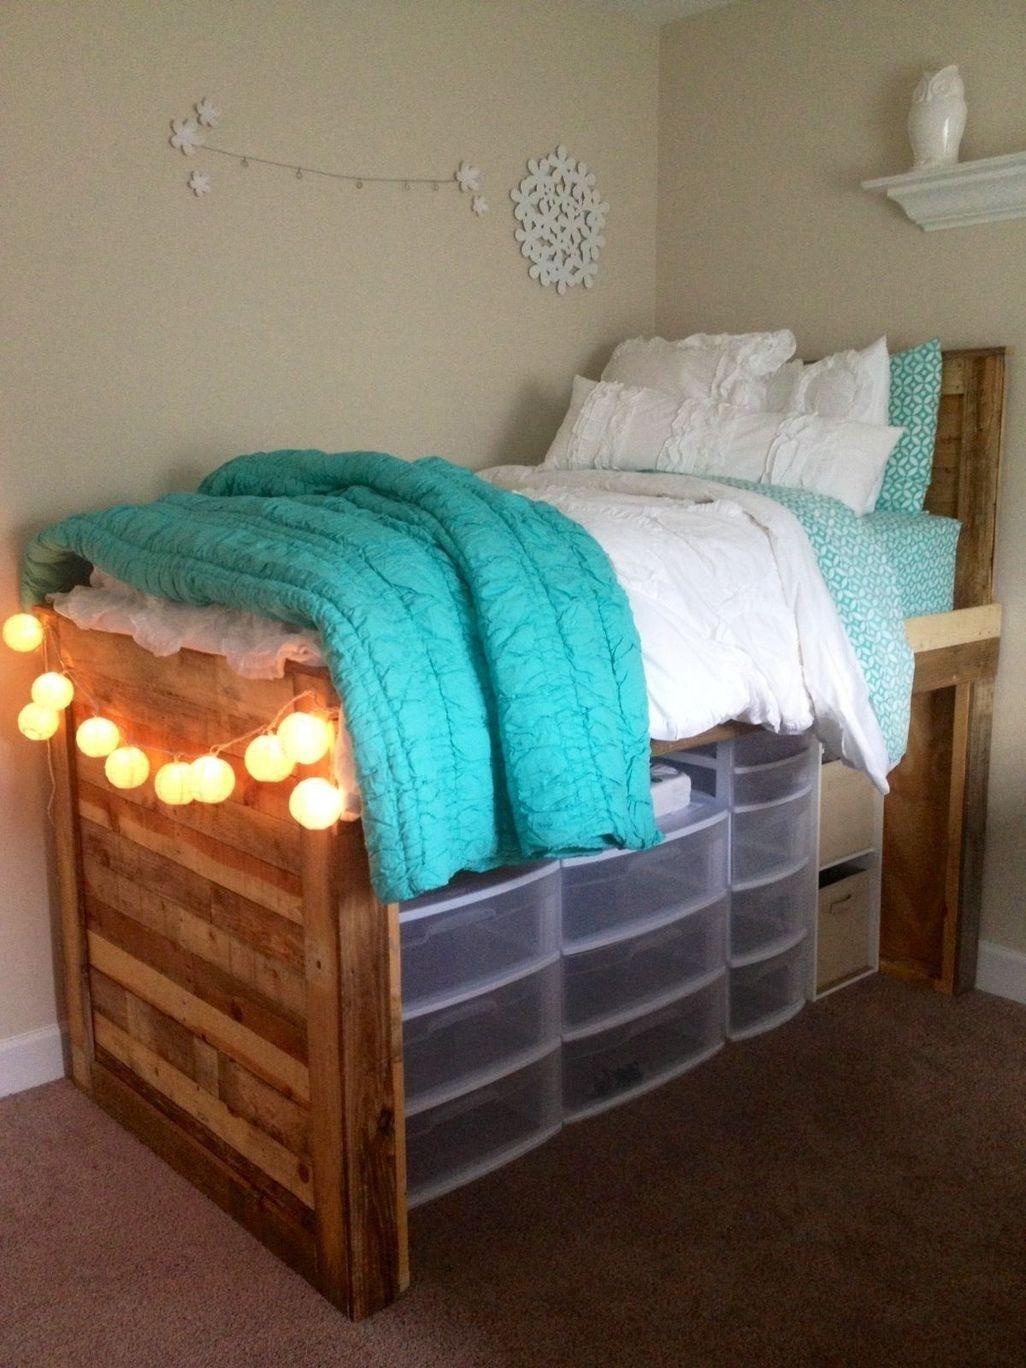 College loft bed ideas   Efficient Dorm Room Organization Ideas  Dorm ideas  Pinterest